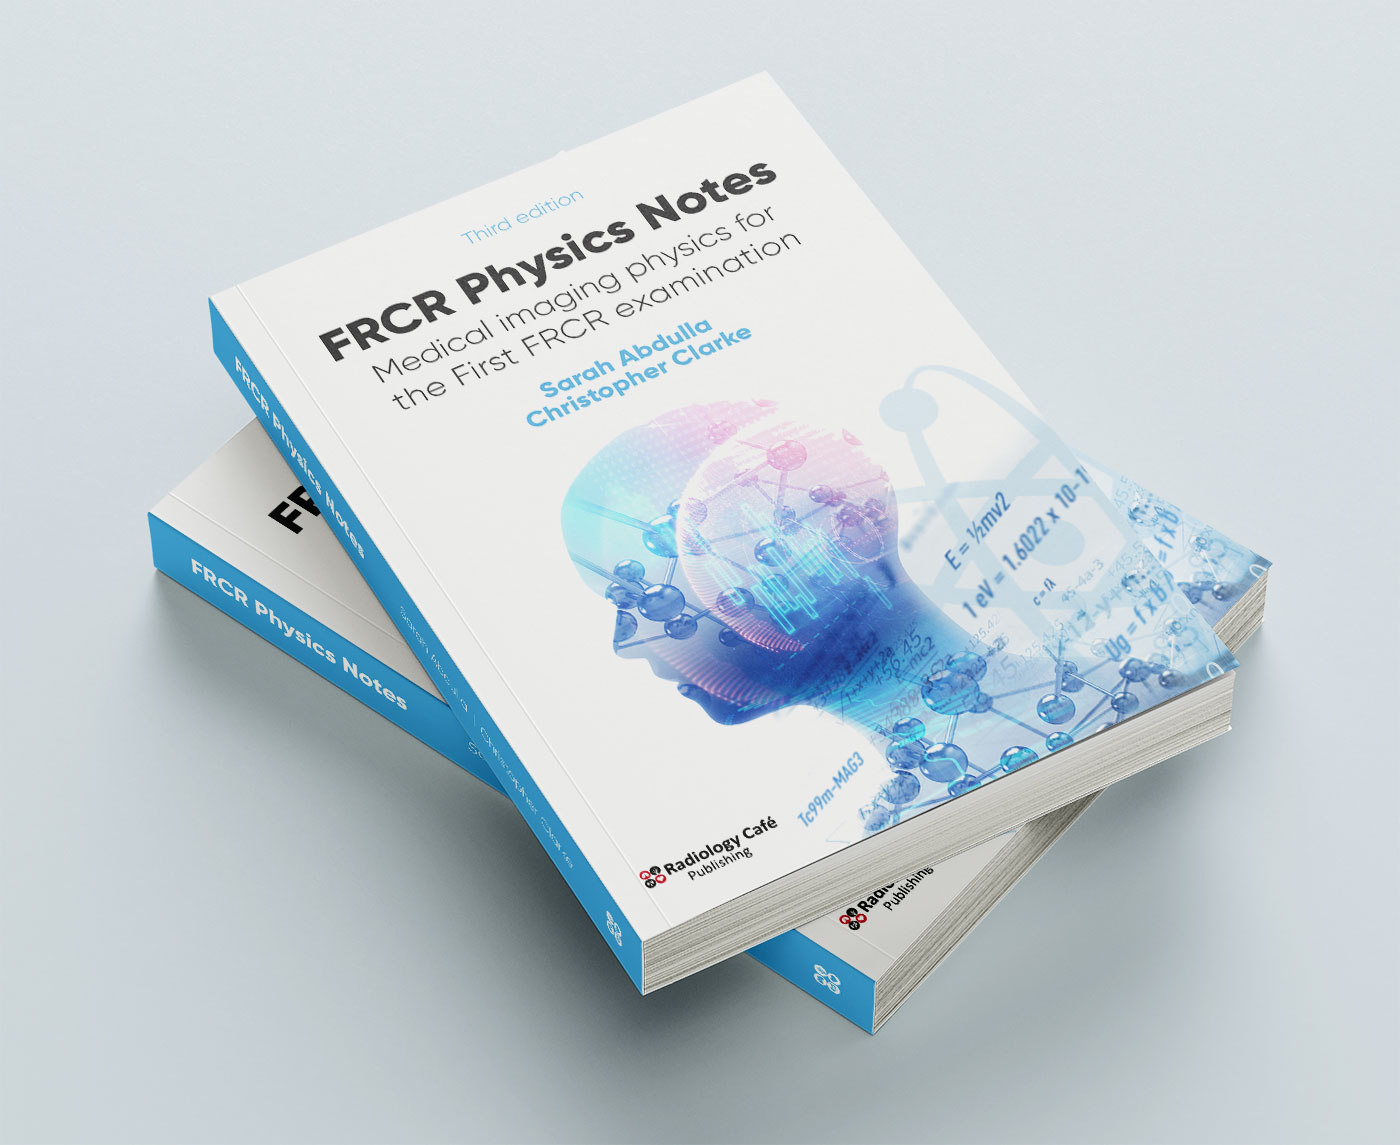 FRCR Physics Notes books